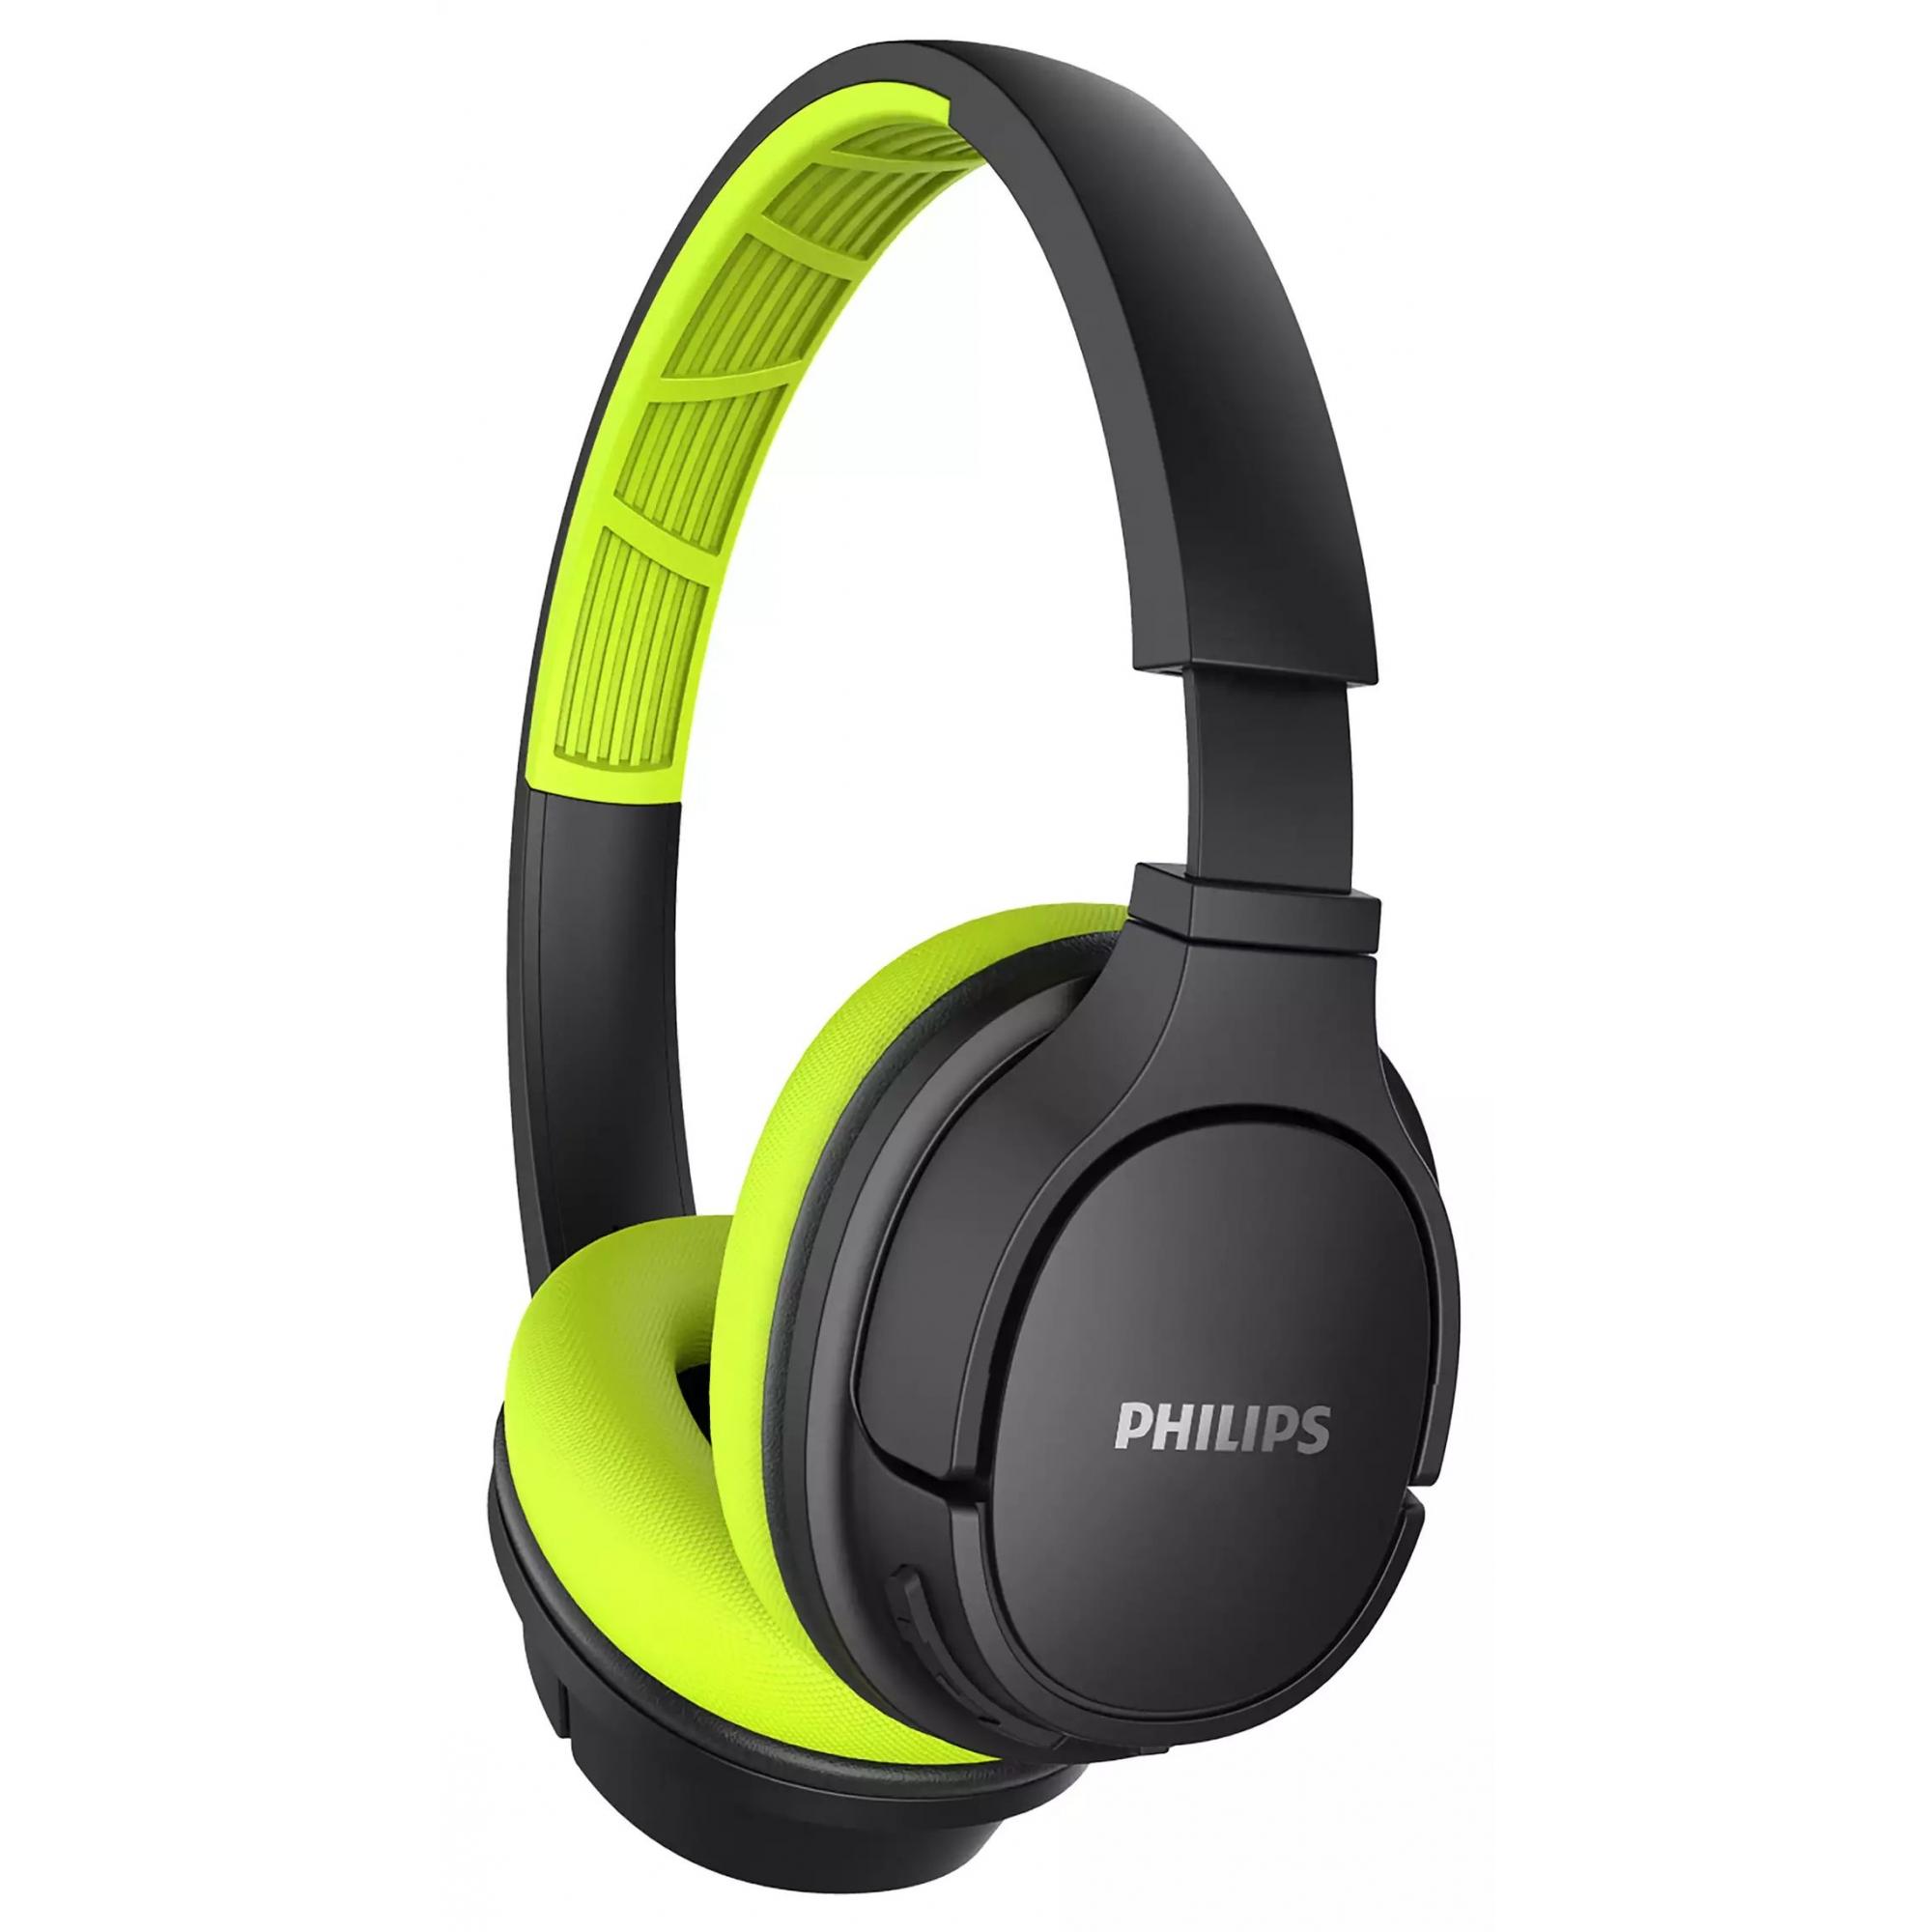 Fone de Ouvido Esportivo Bluetooth Philips TASH402LF/00 - Preto e Verde